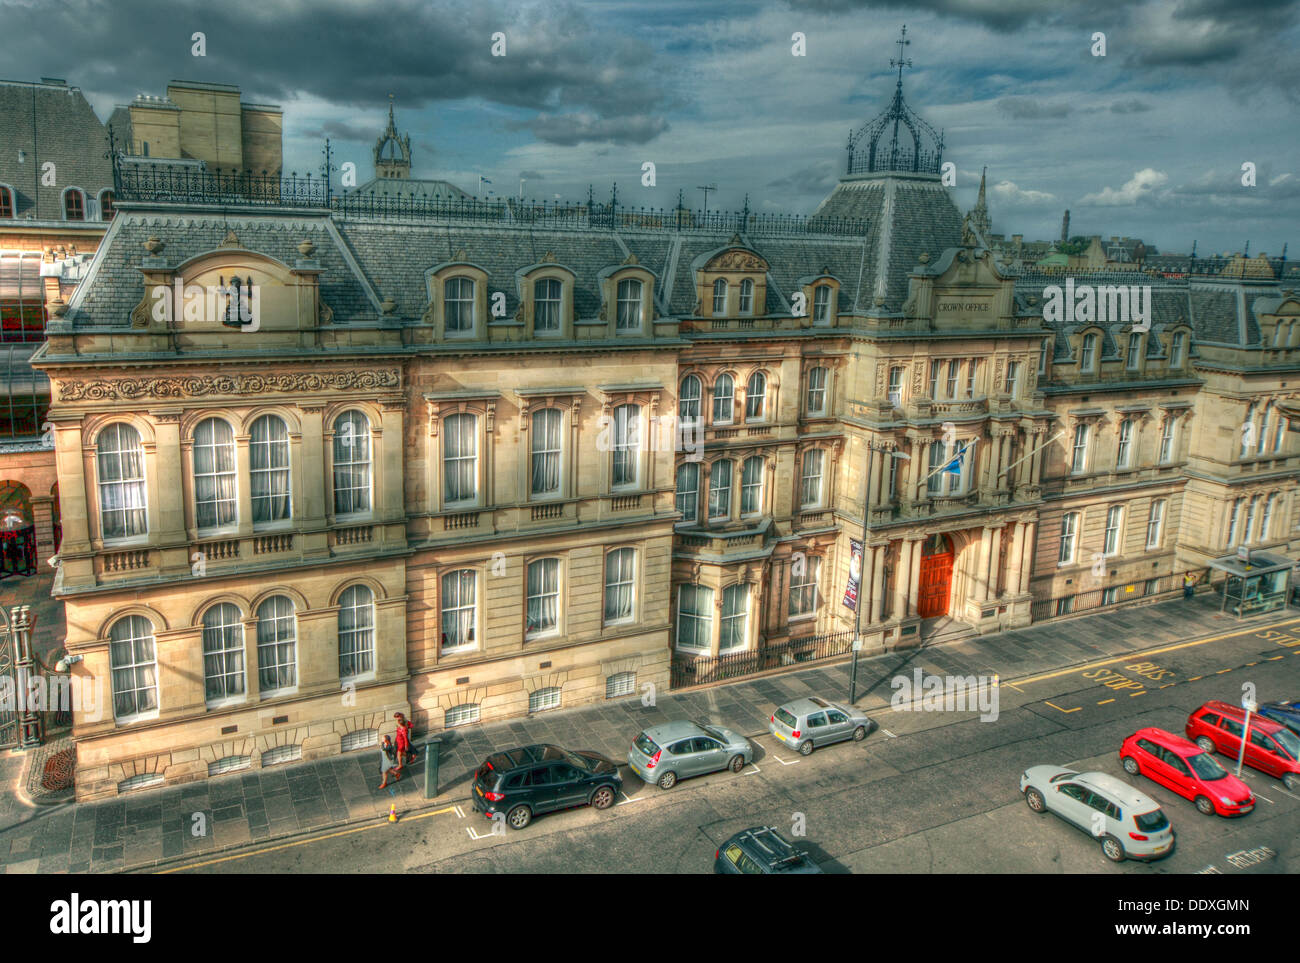 Laden Sie dieses Alamy Stockfoto Edinburgh Crown Office, Chambers Street, Edinburgh, Schottland, UK, EH1 1LA - DDXGMN